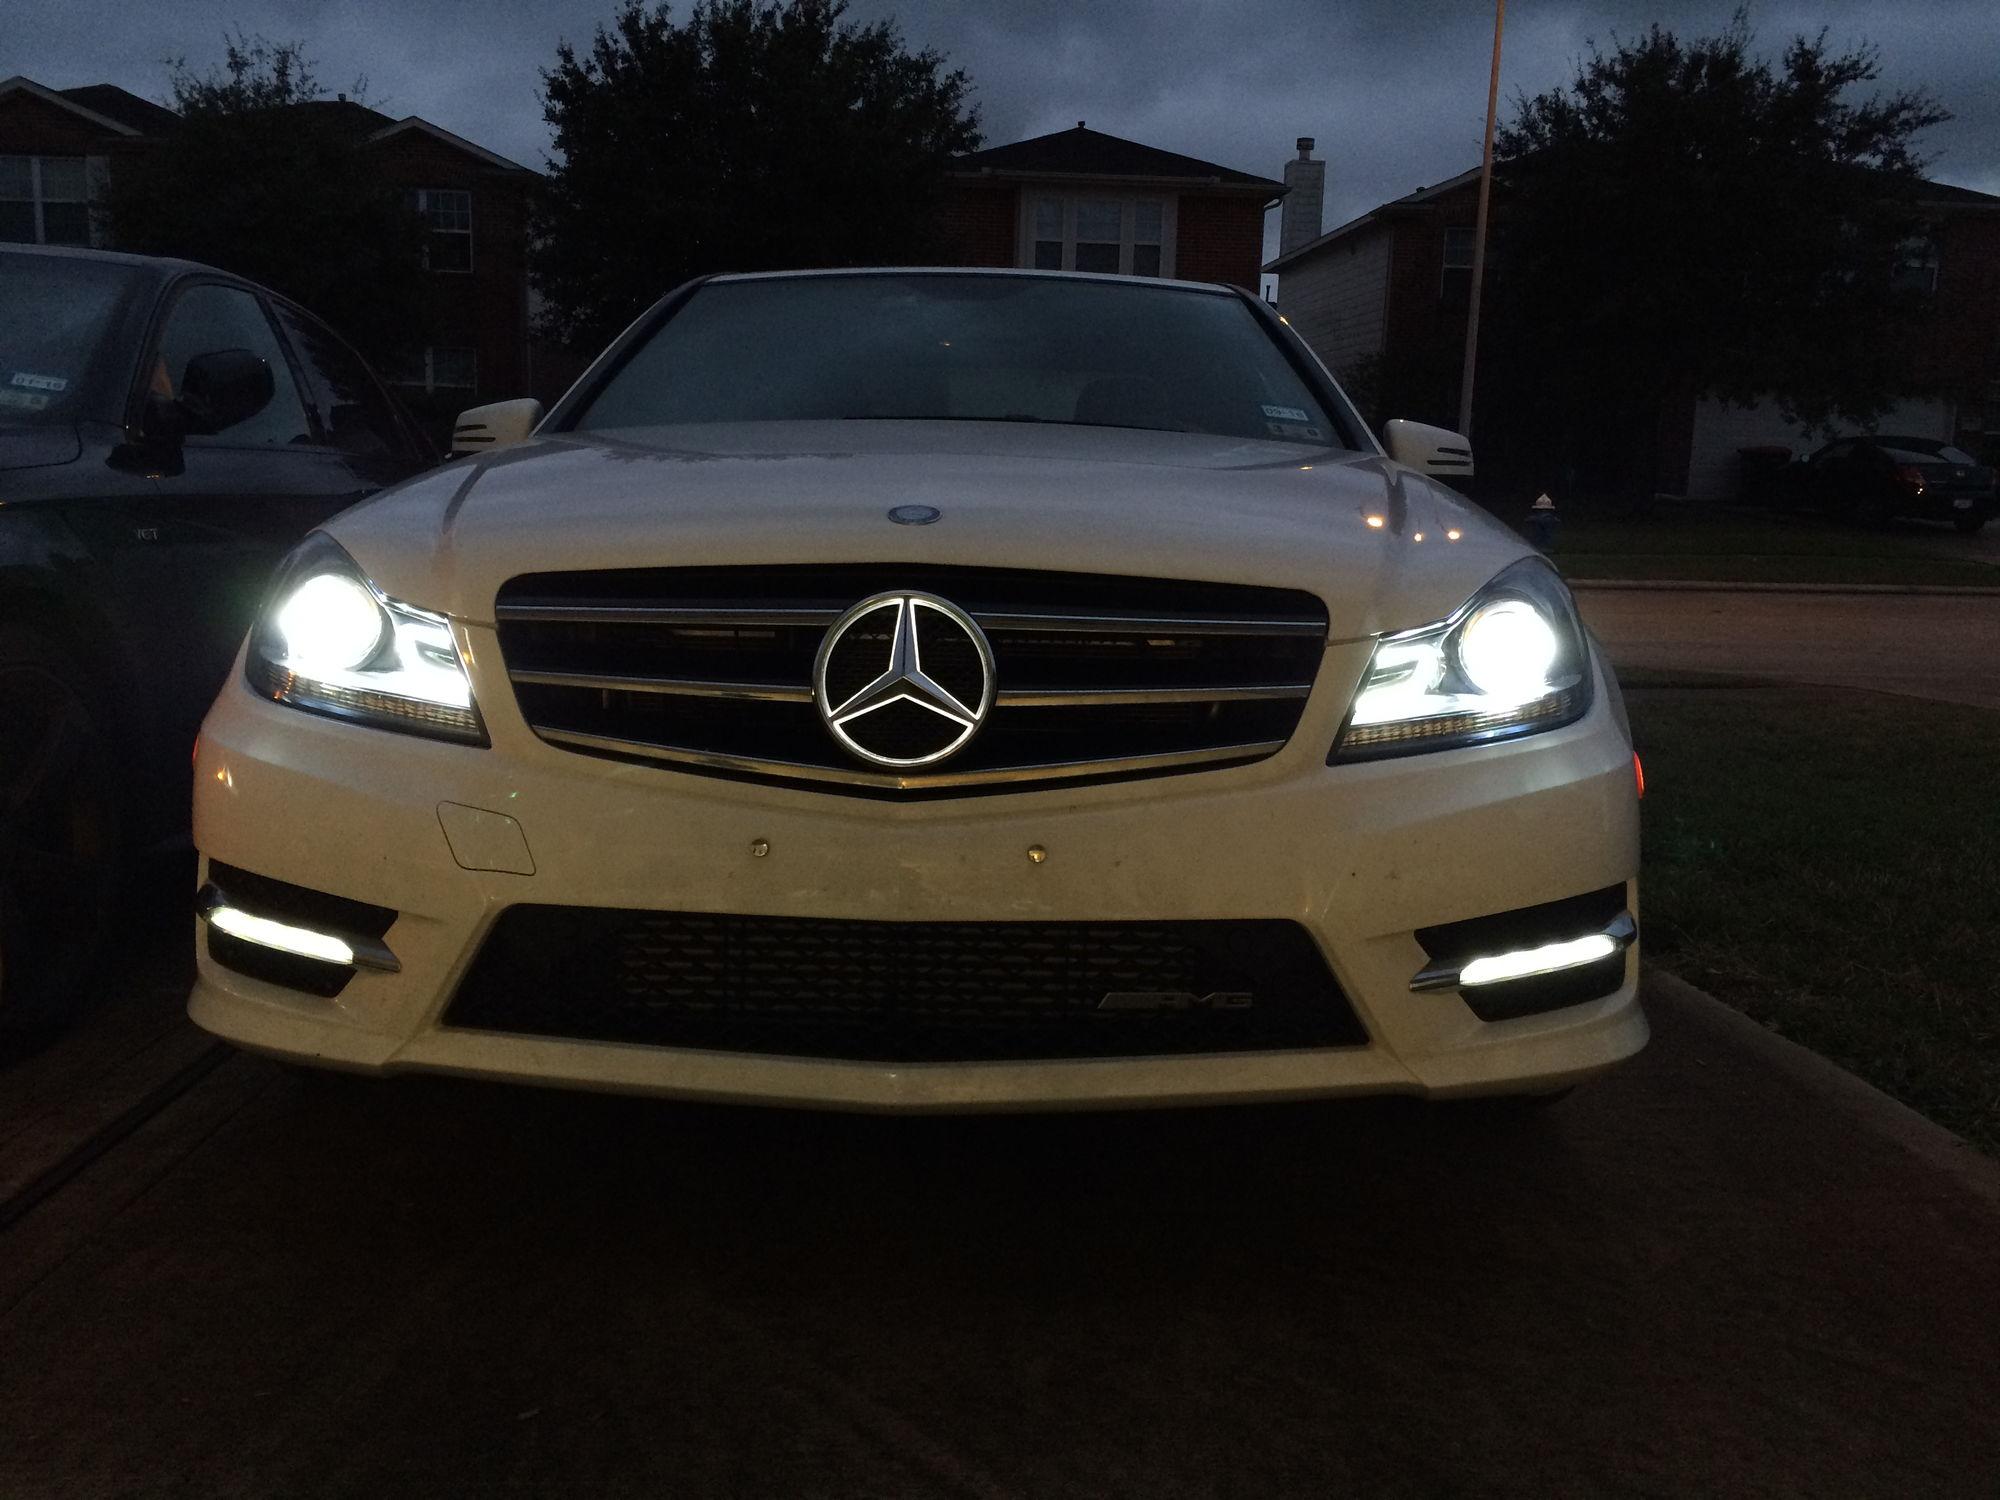 Mb illuminated star forums for Mercedes benz illuminated star